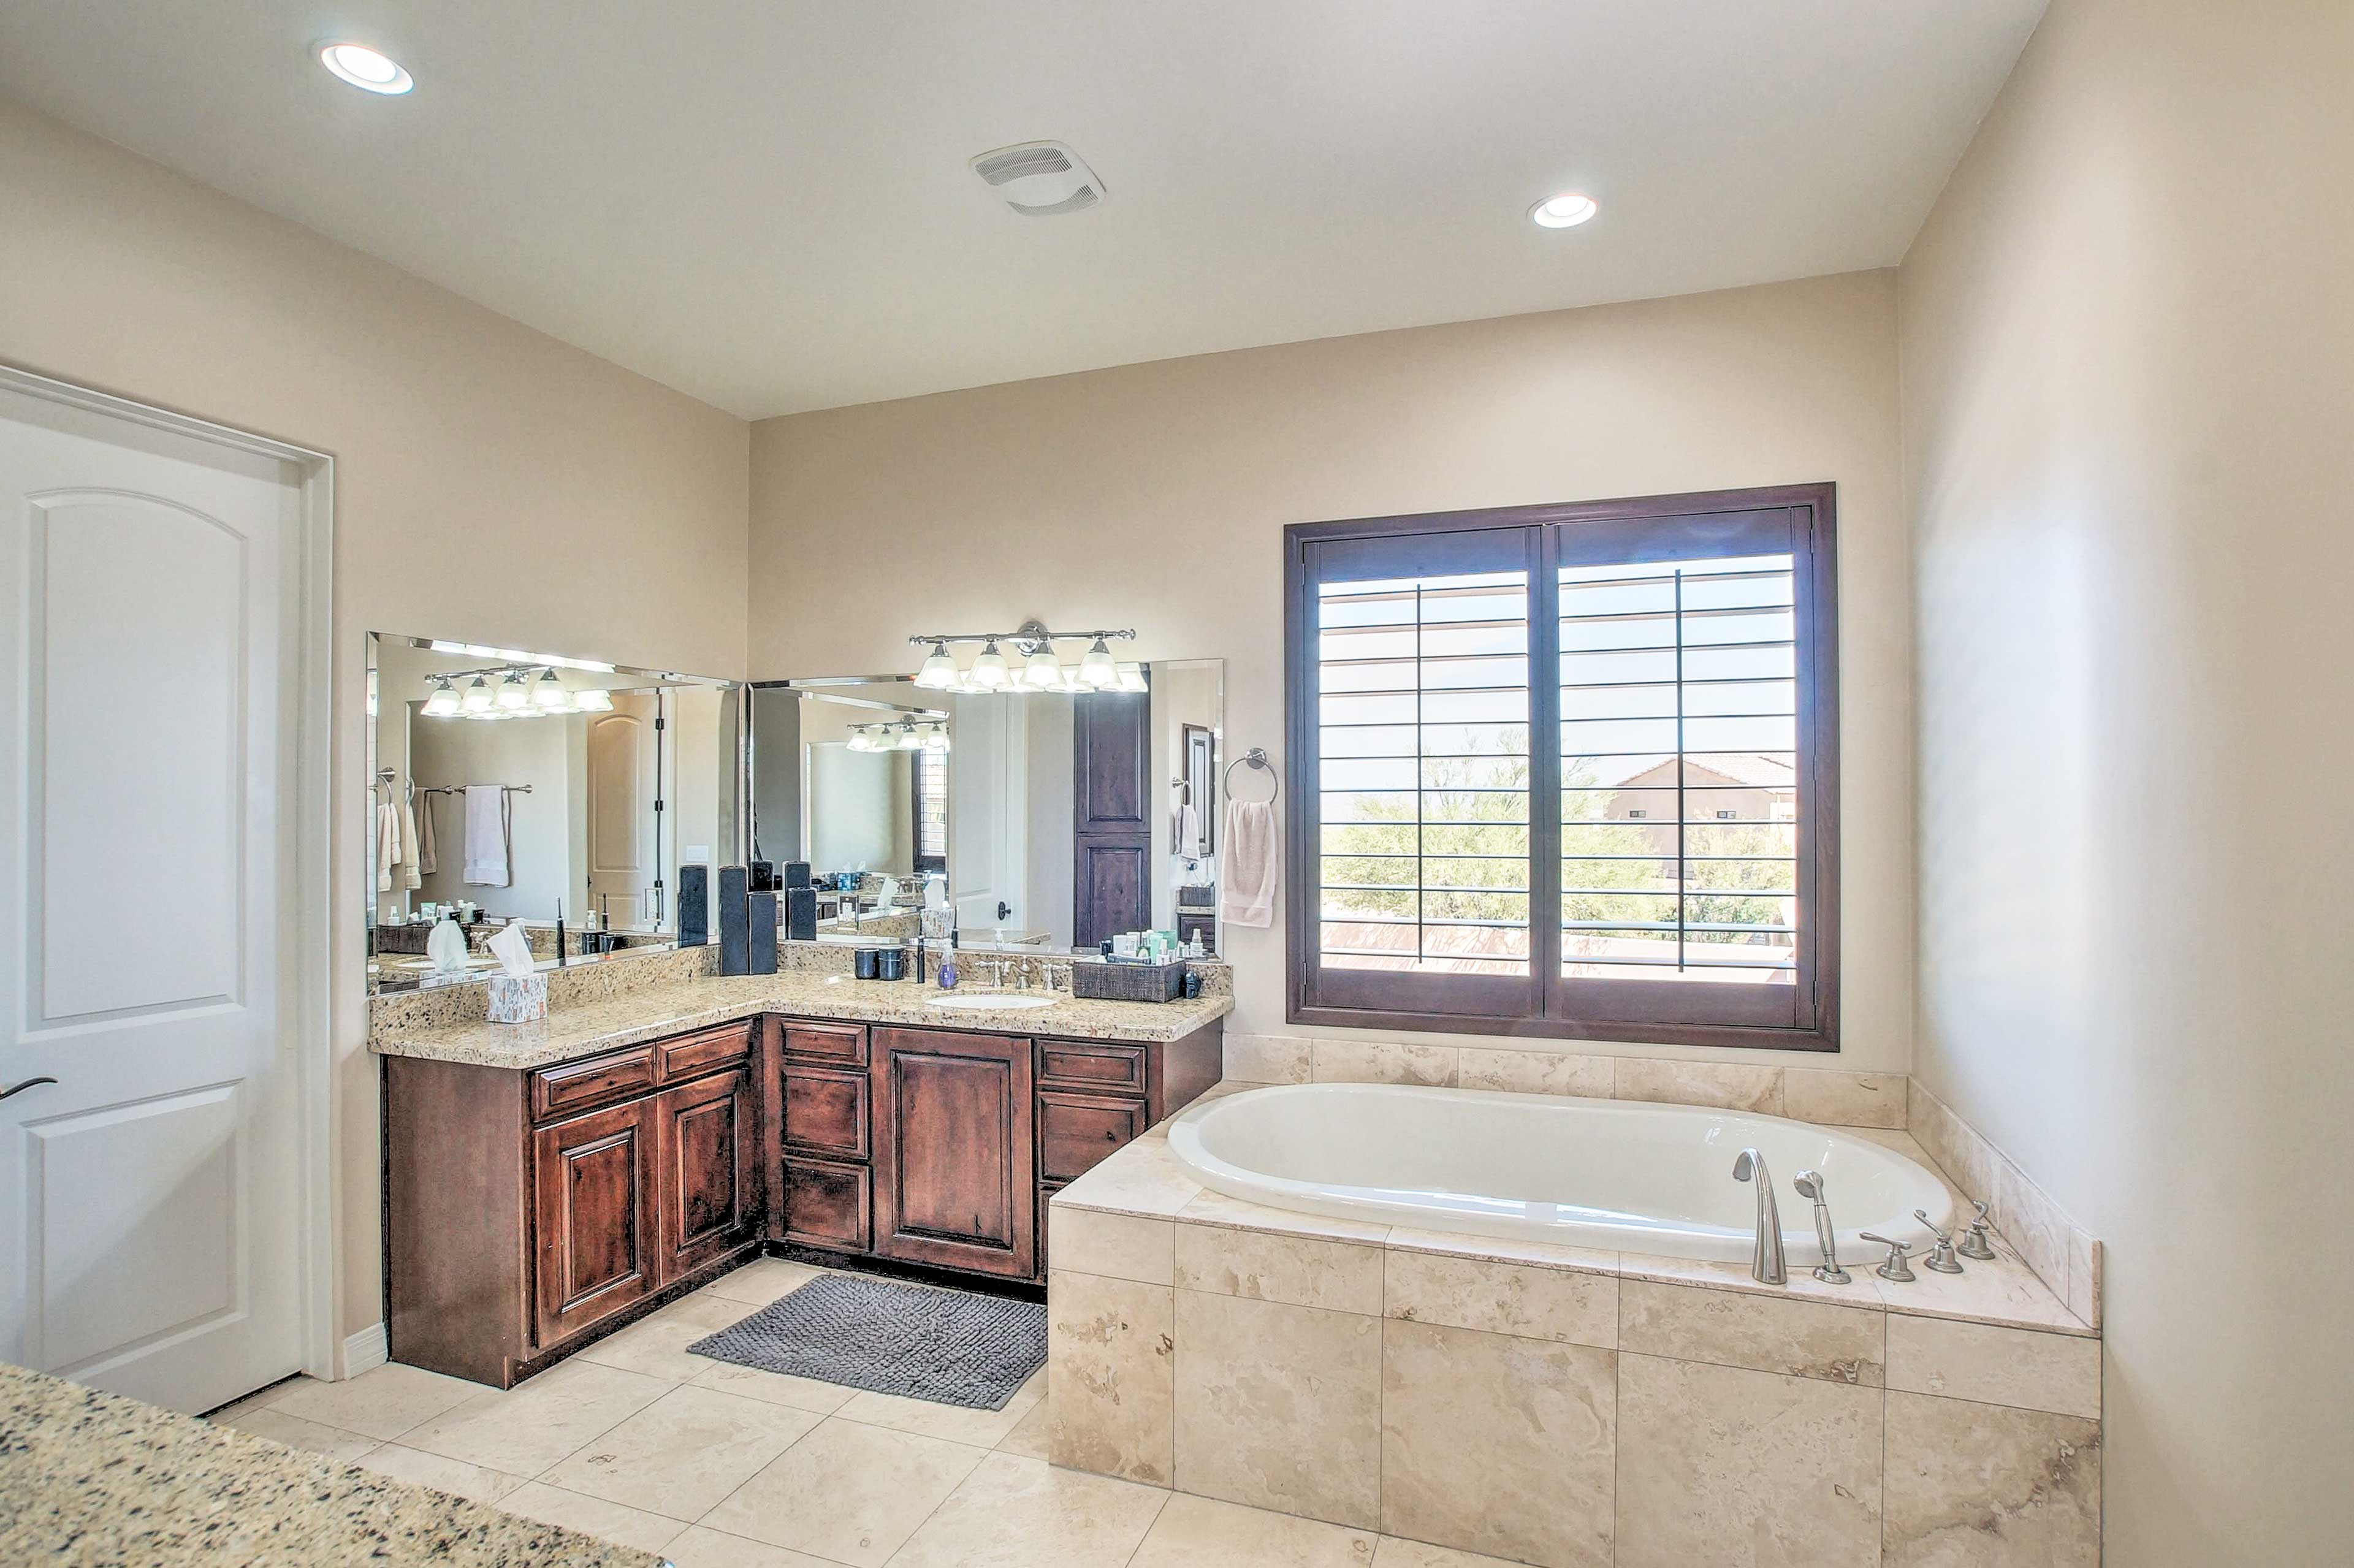 Soak your night away in the large bathtub.